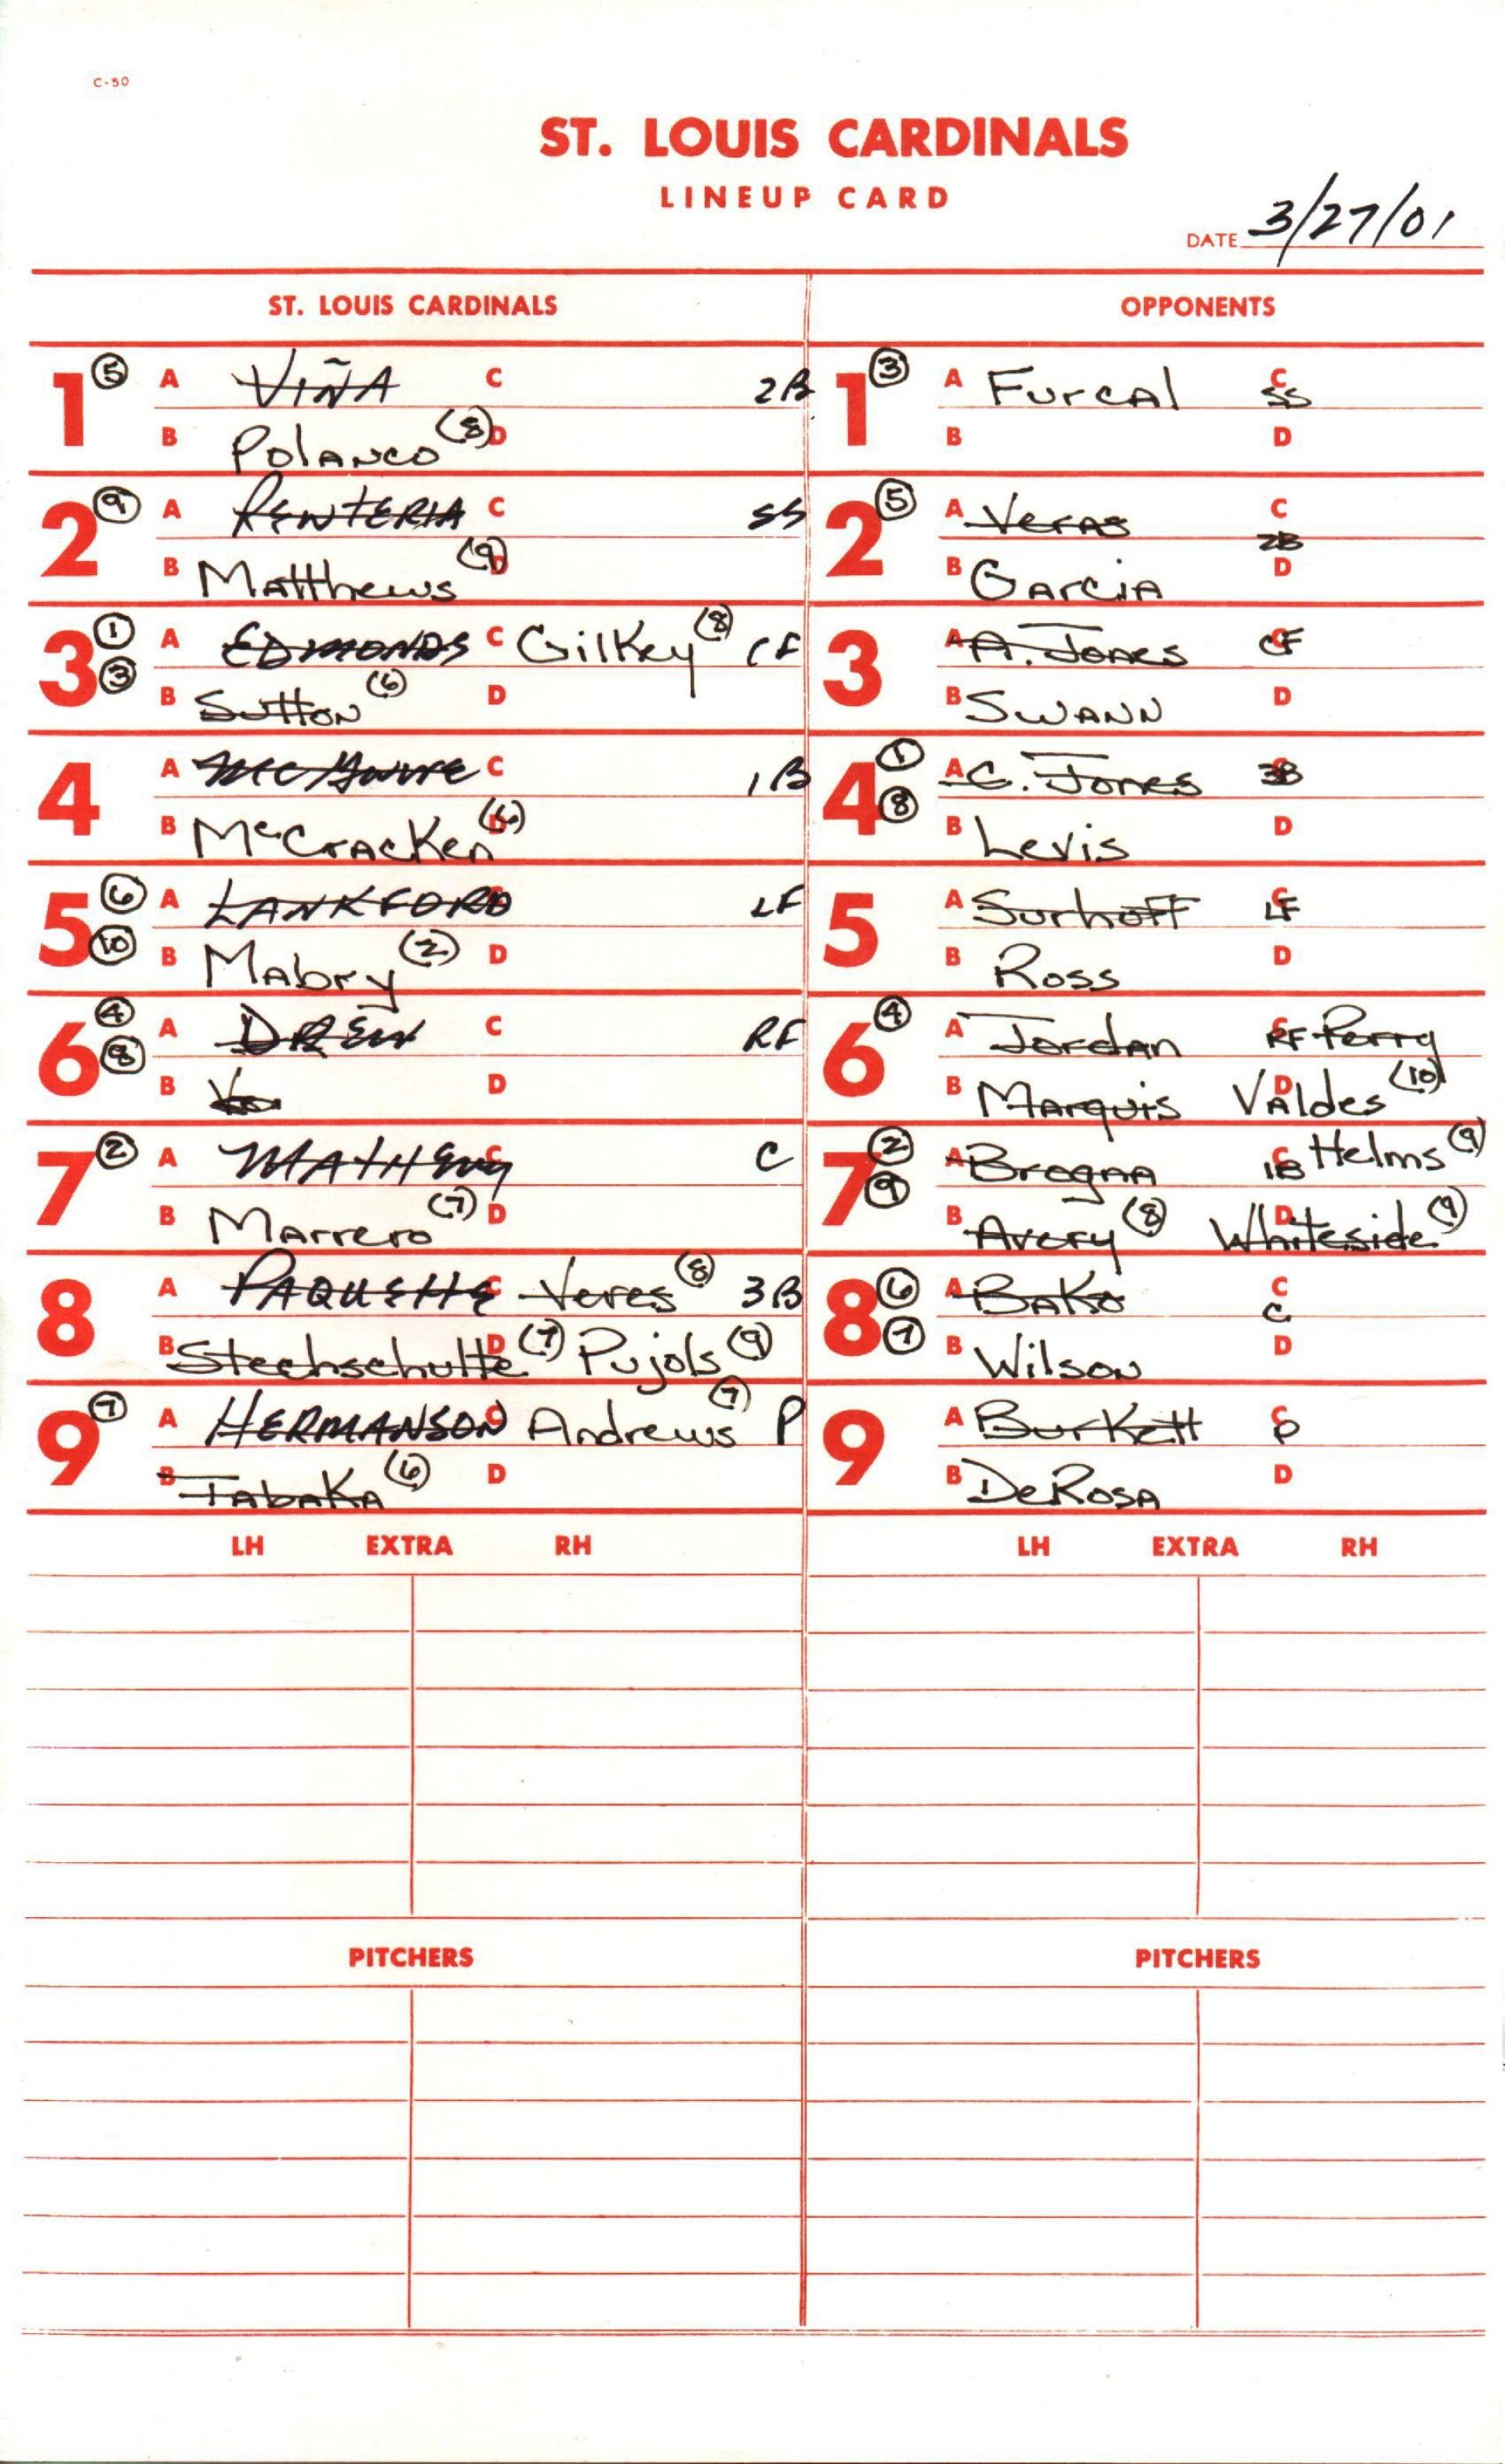 009 Magnificent Little League Lineup Card Template Sample  Baseball1920